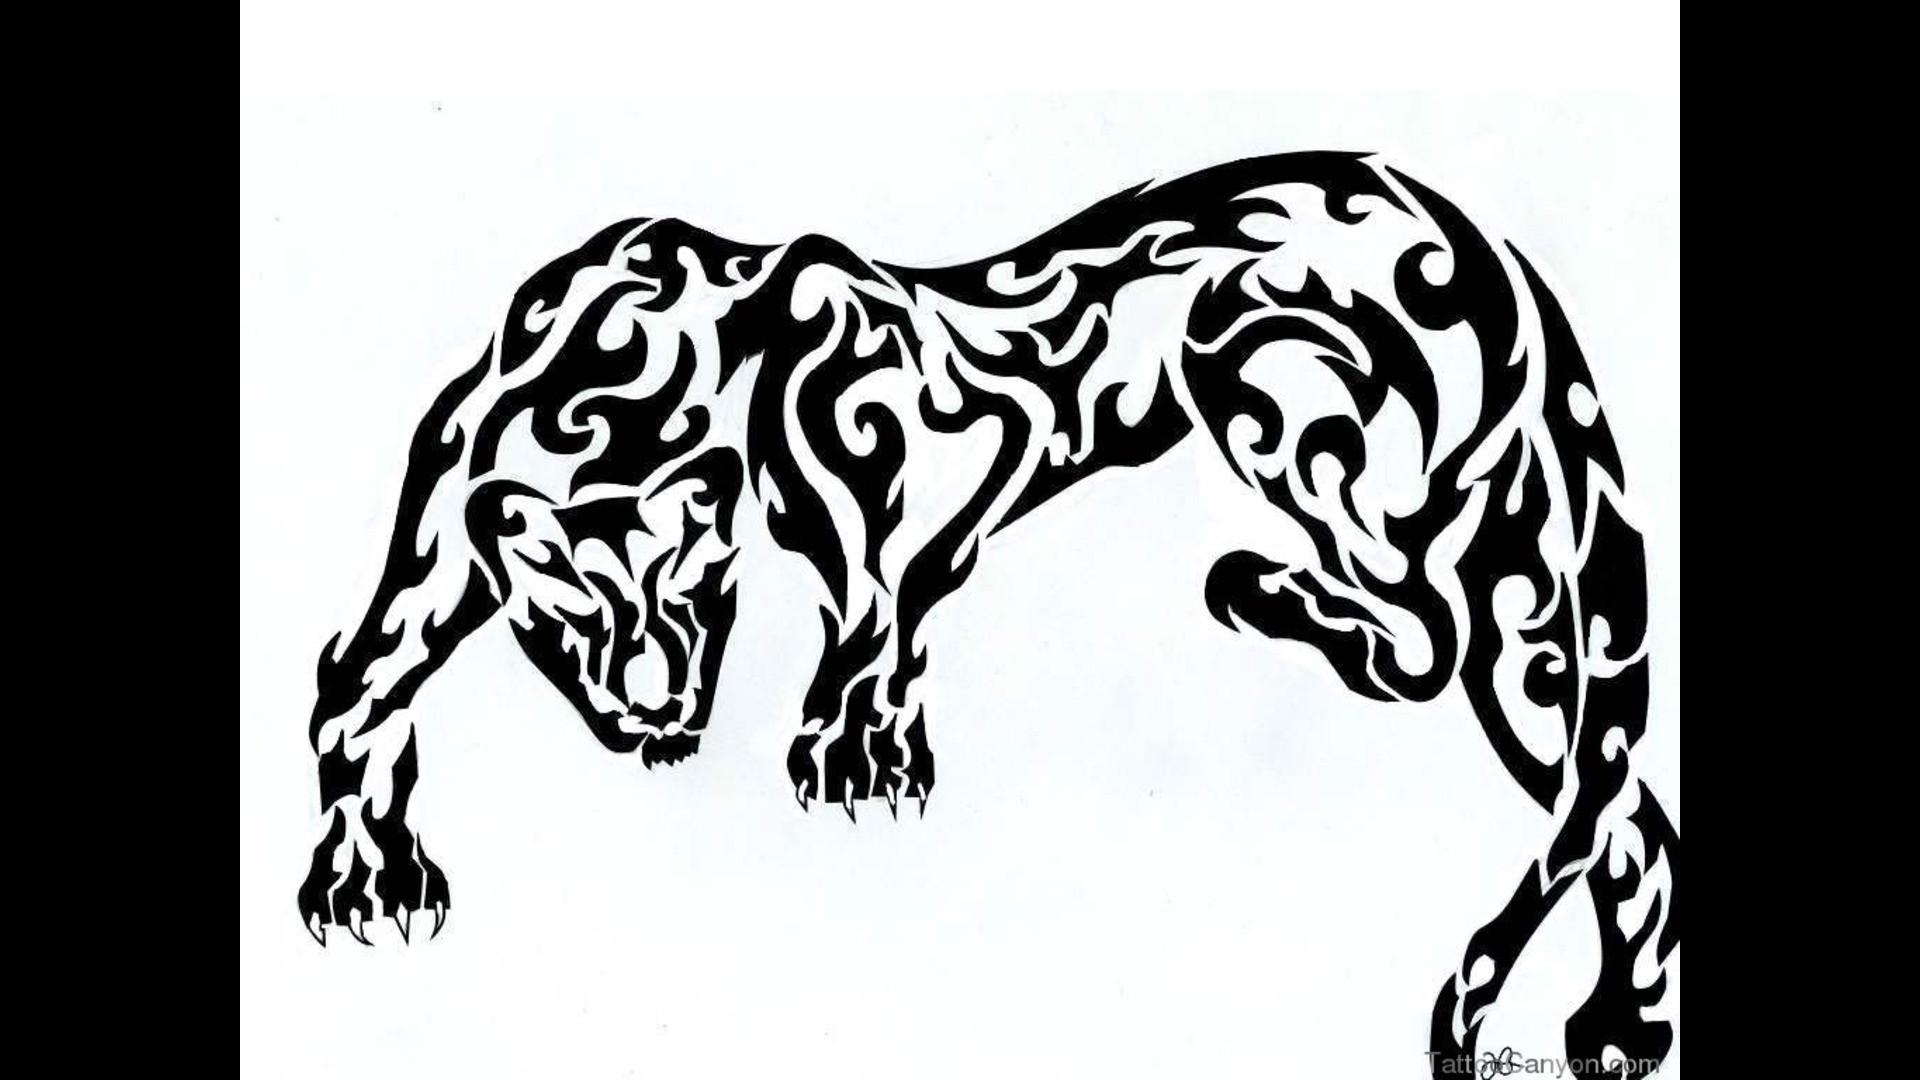 tattoo design wallpaper. Black Bedroom Furniture Sets. Home Design Ideas